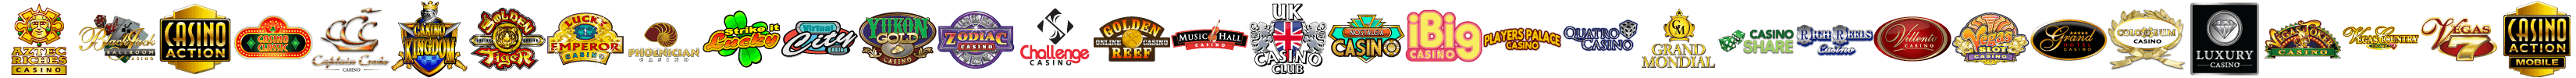 https://i.servimg.com/u/f74/13/42/00/54/casino10.png